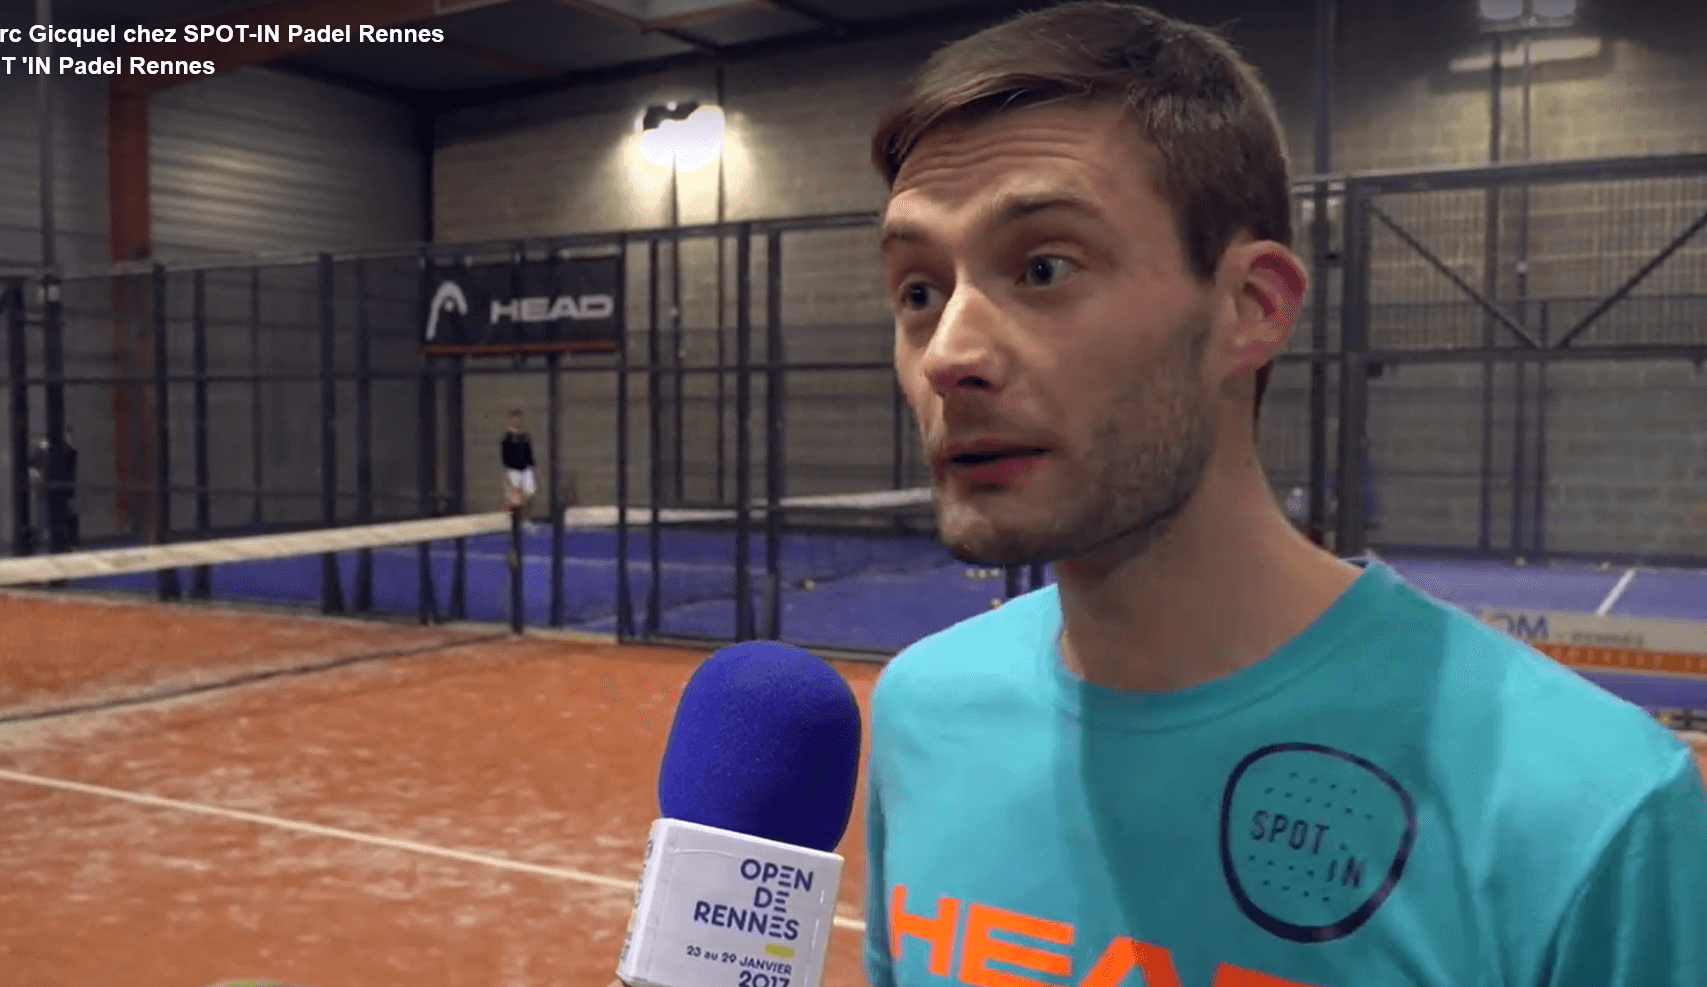 Marc Gicquel brilla a padel a Spot'in Rennes